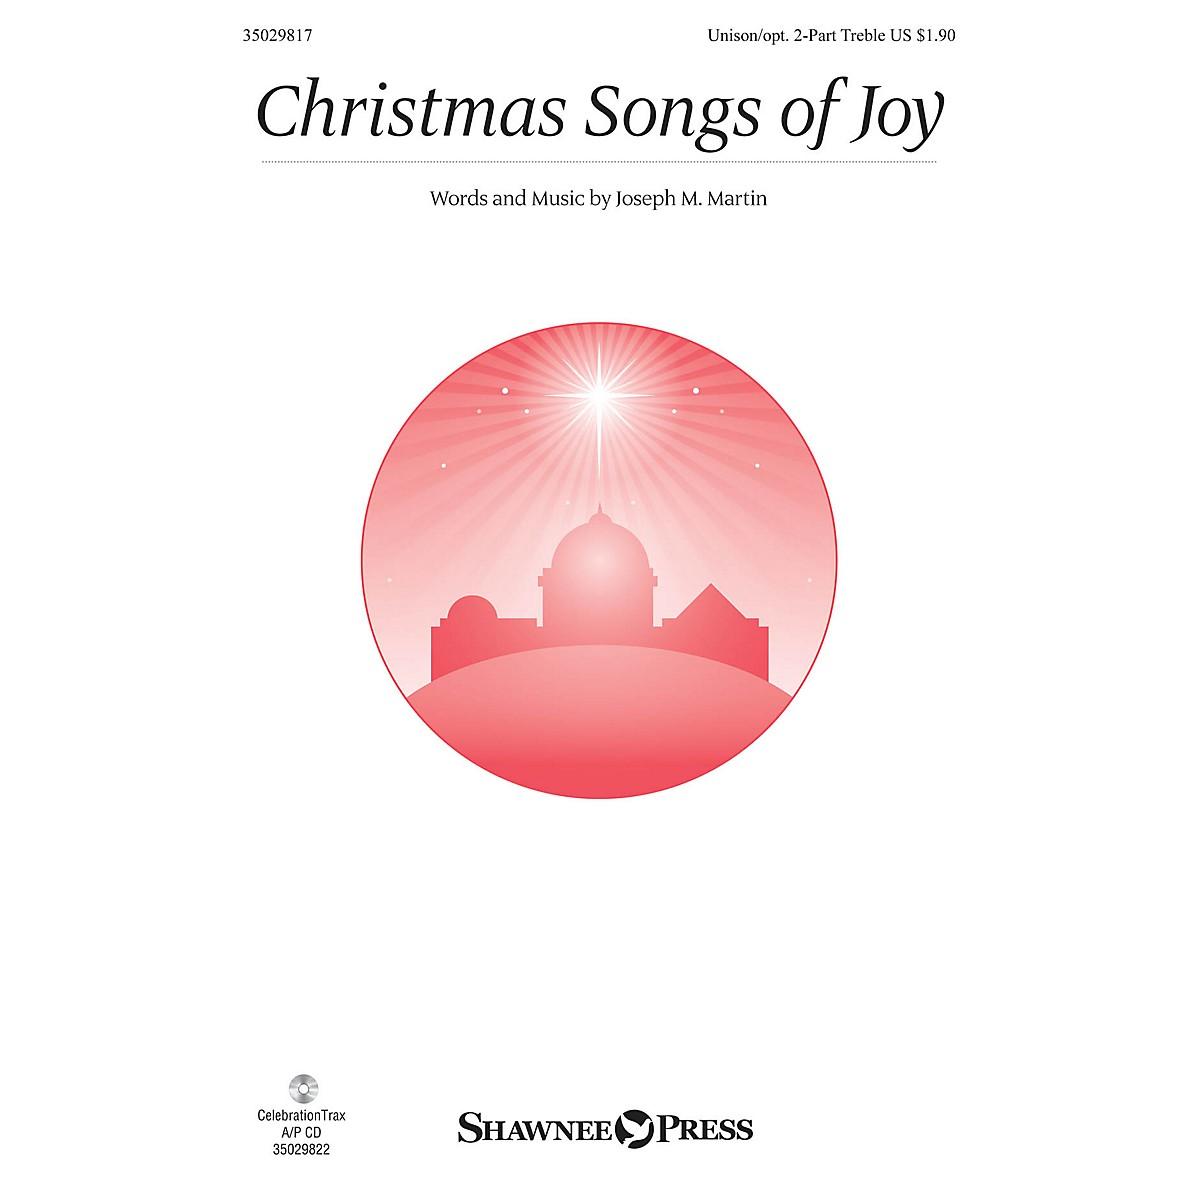 Shawnee Press Christmas Songs of Joy Unison/2-Part Treble composed by Joseph M. Martin